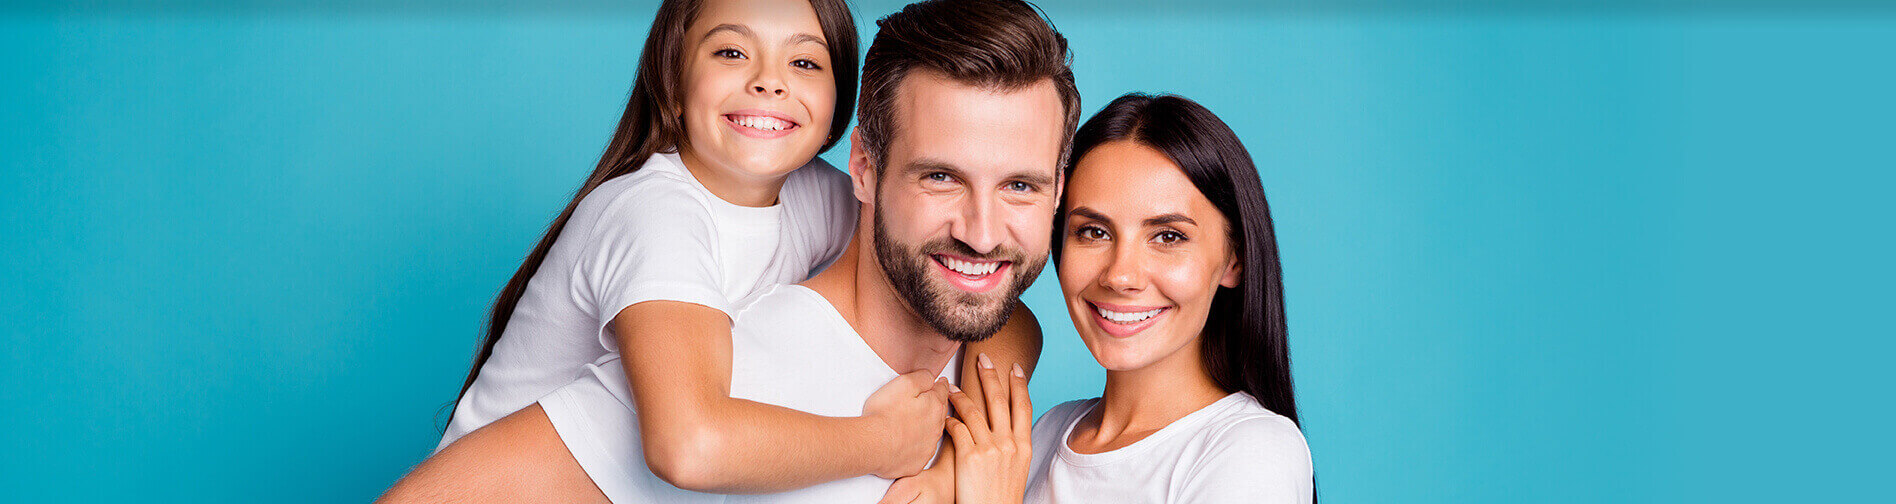 pediatric dentist in san antonio